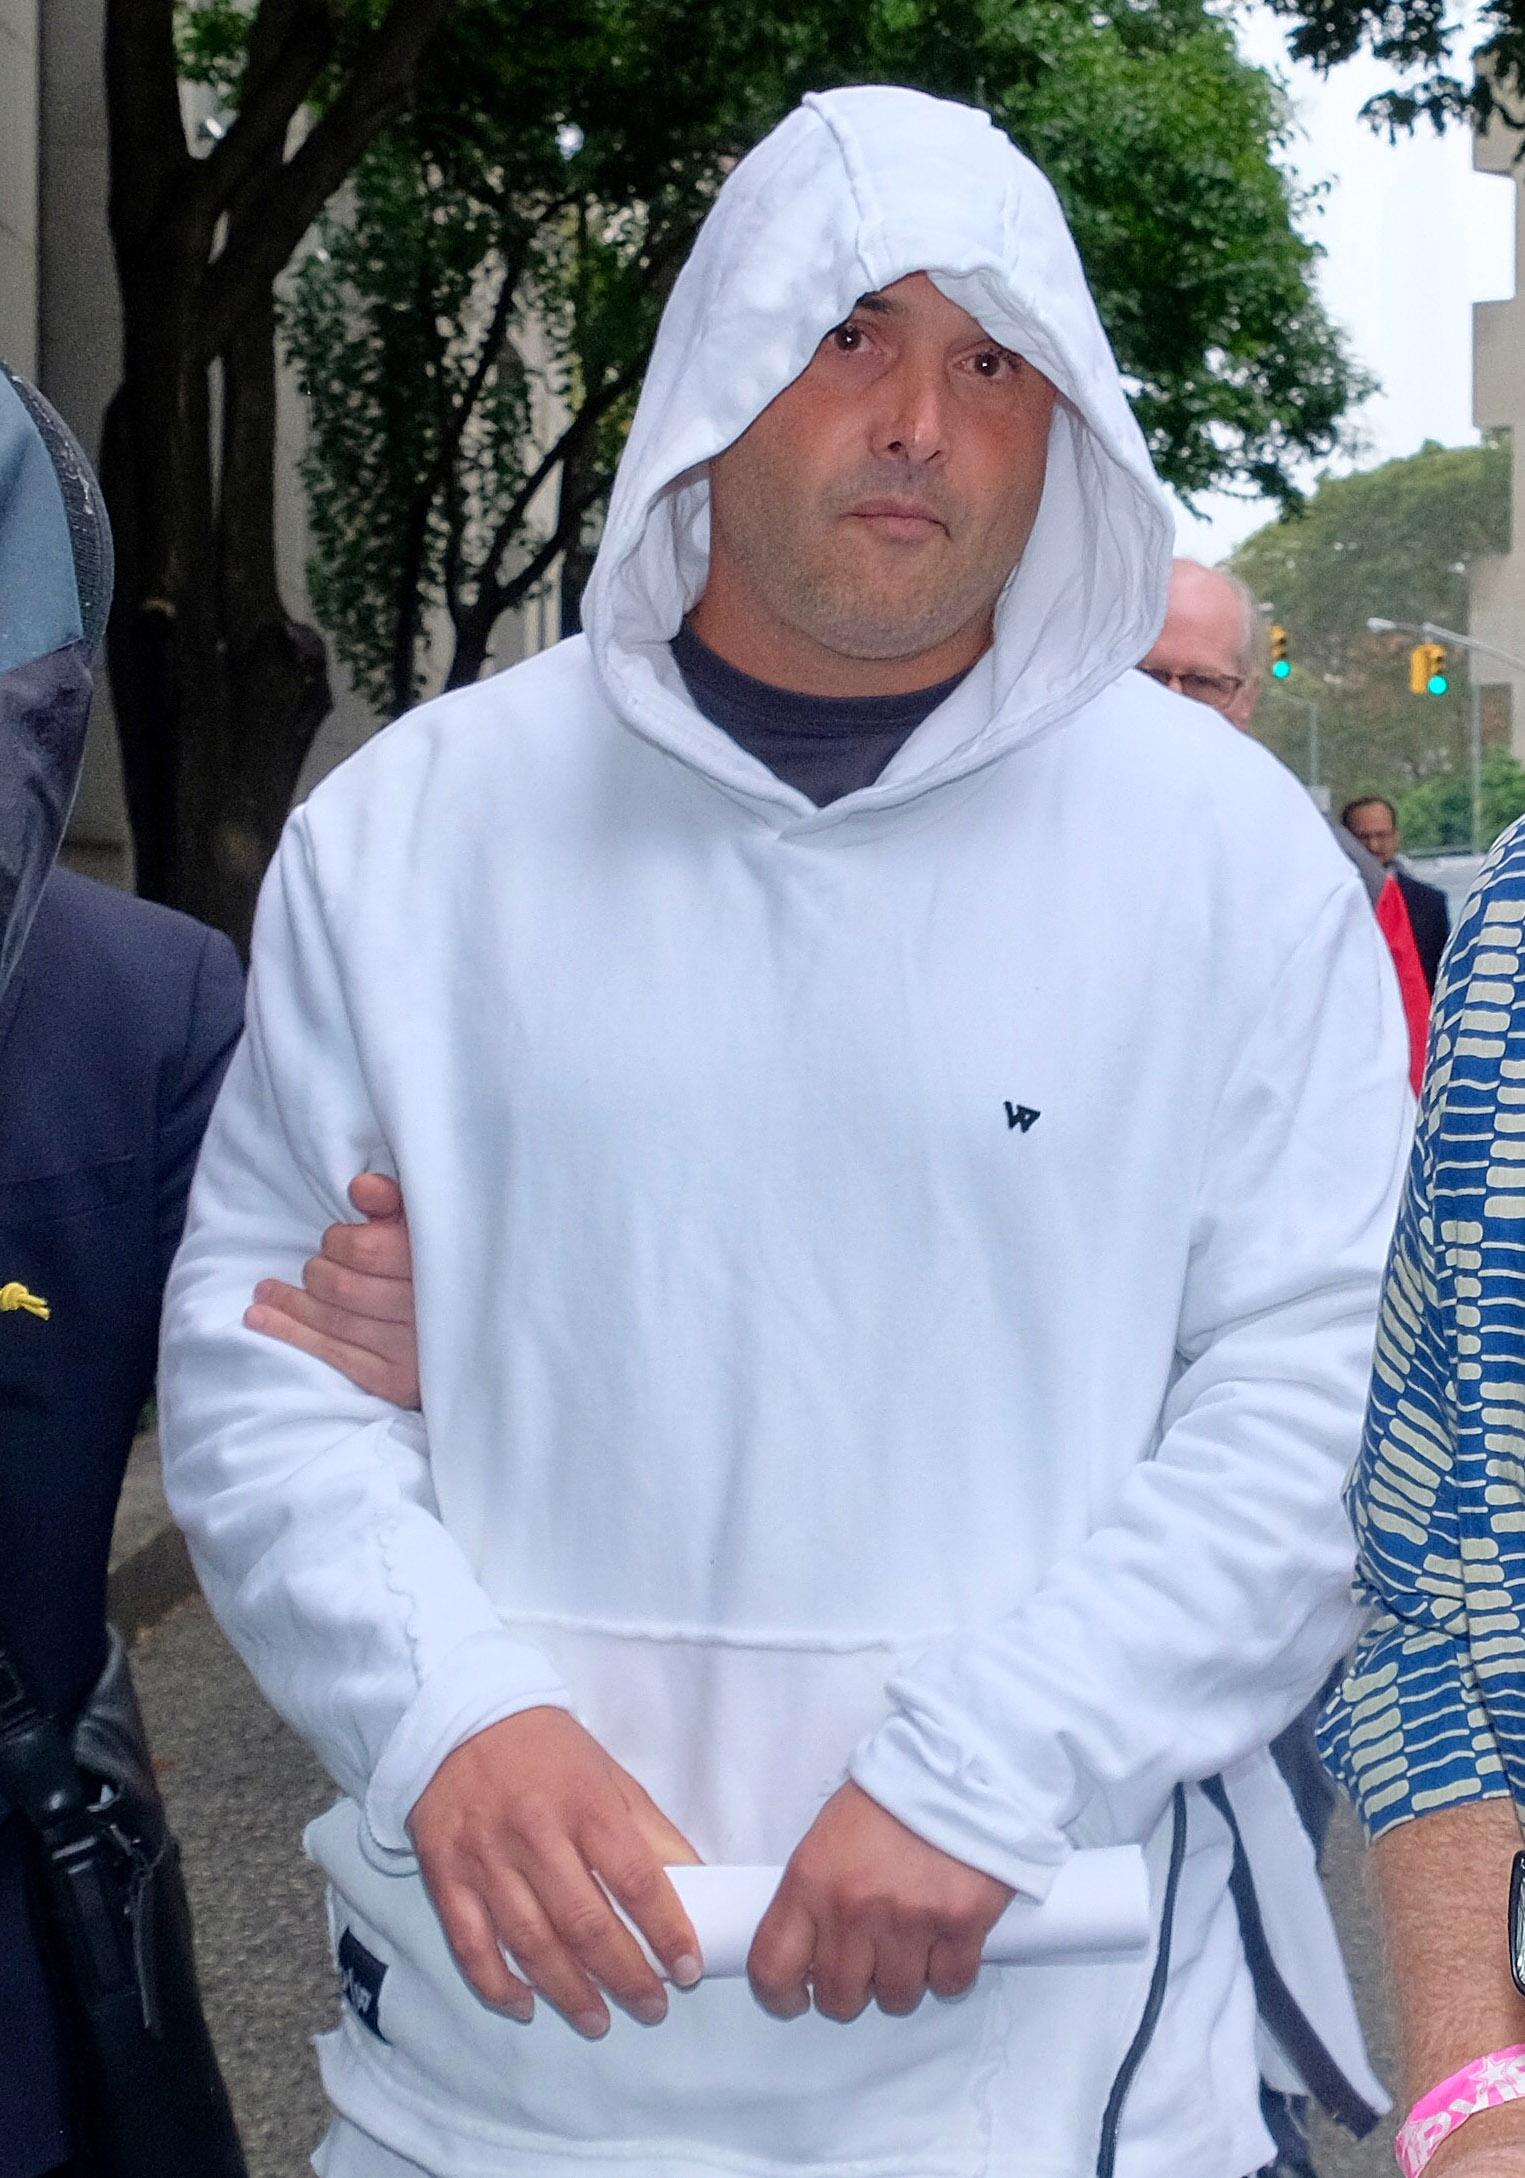 Former WFAN Host Craig Carton Gets 42-Month Prison Term For Ticket Fraud –  Deadline